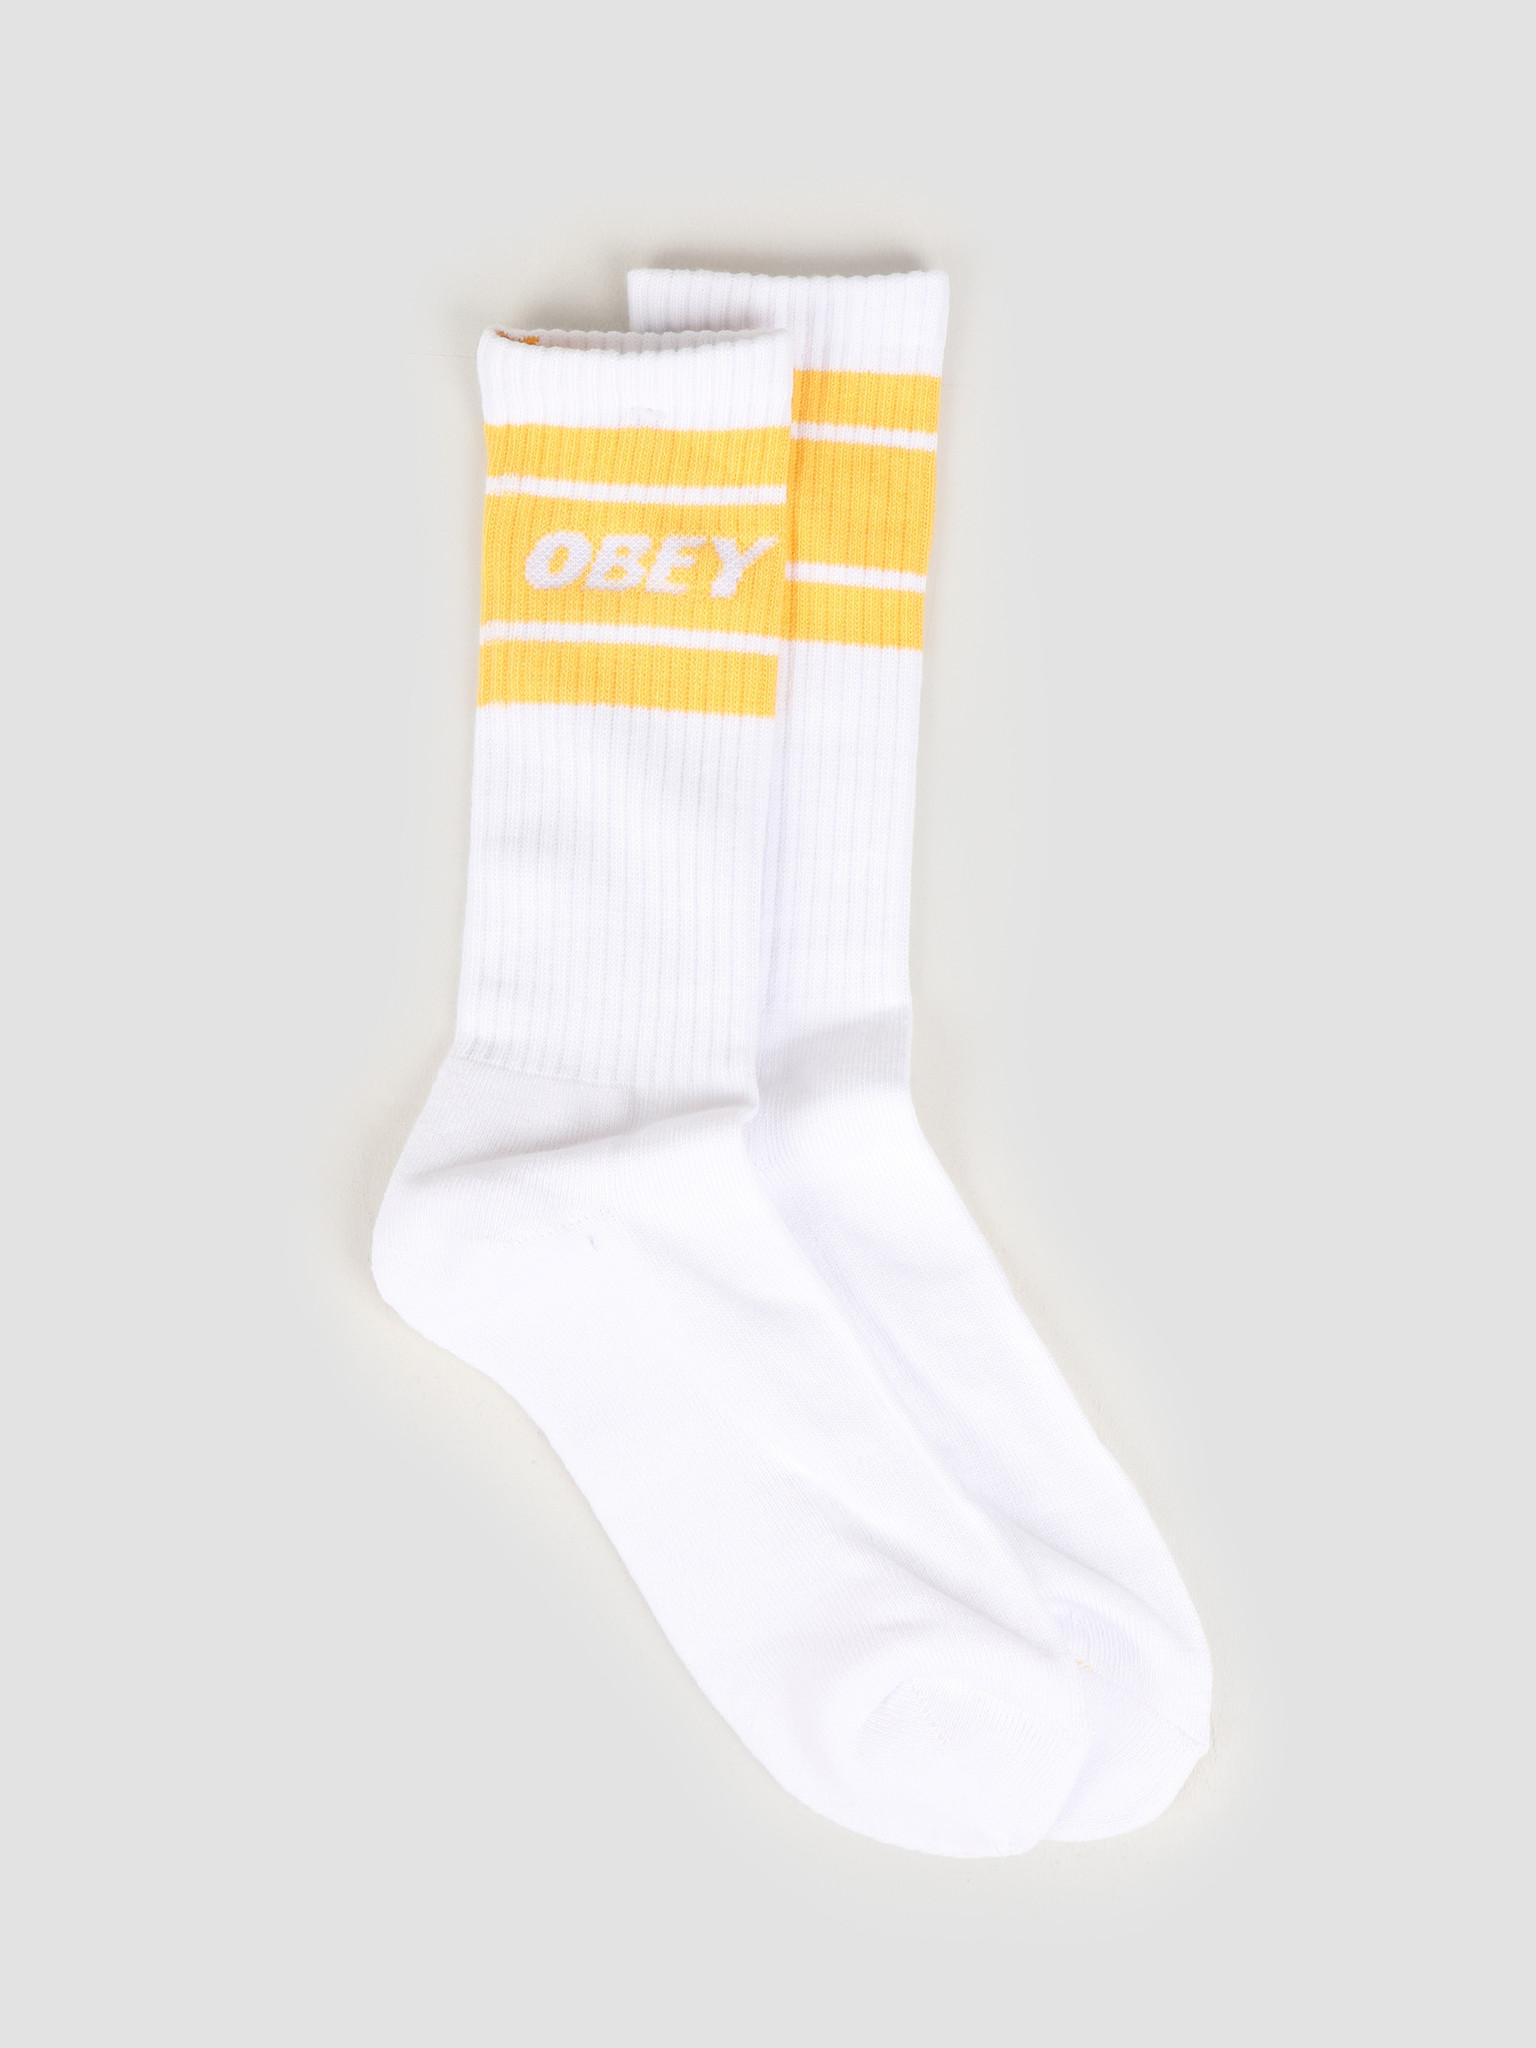 Obey Obey Cooper II Socks White / mellow yellow 100260093 WMY